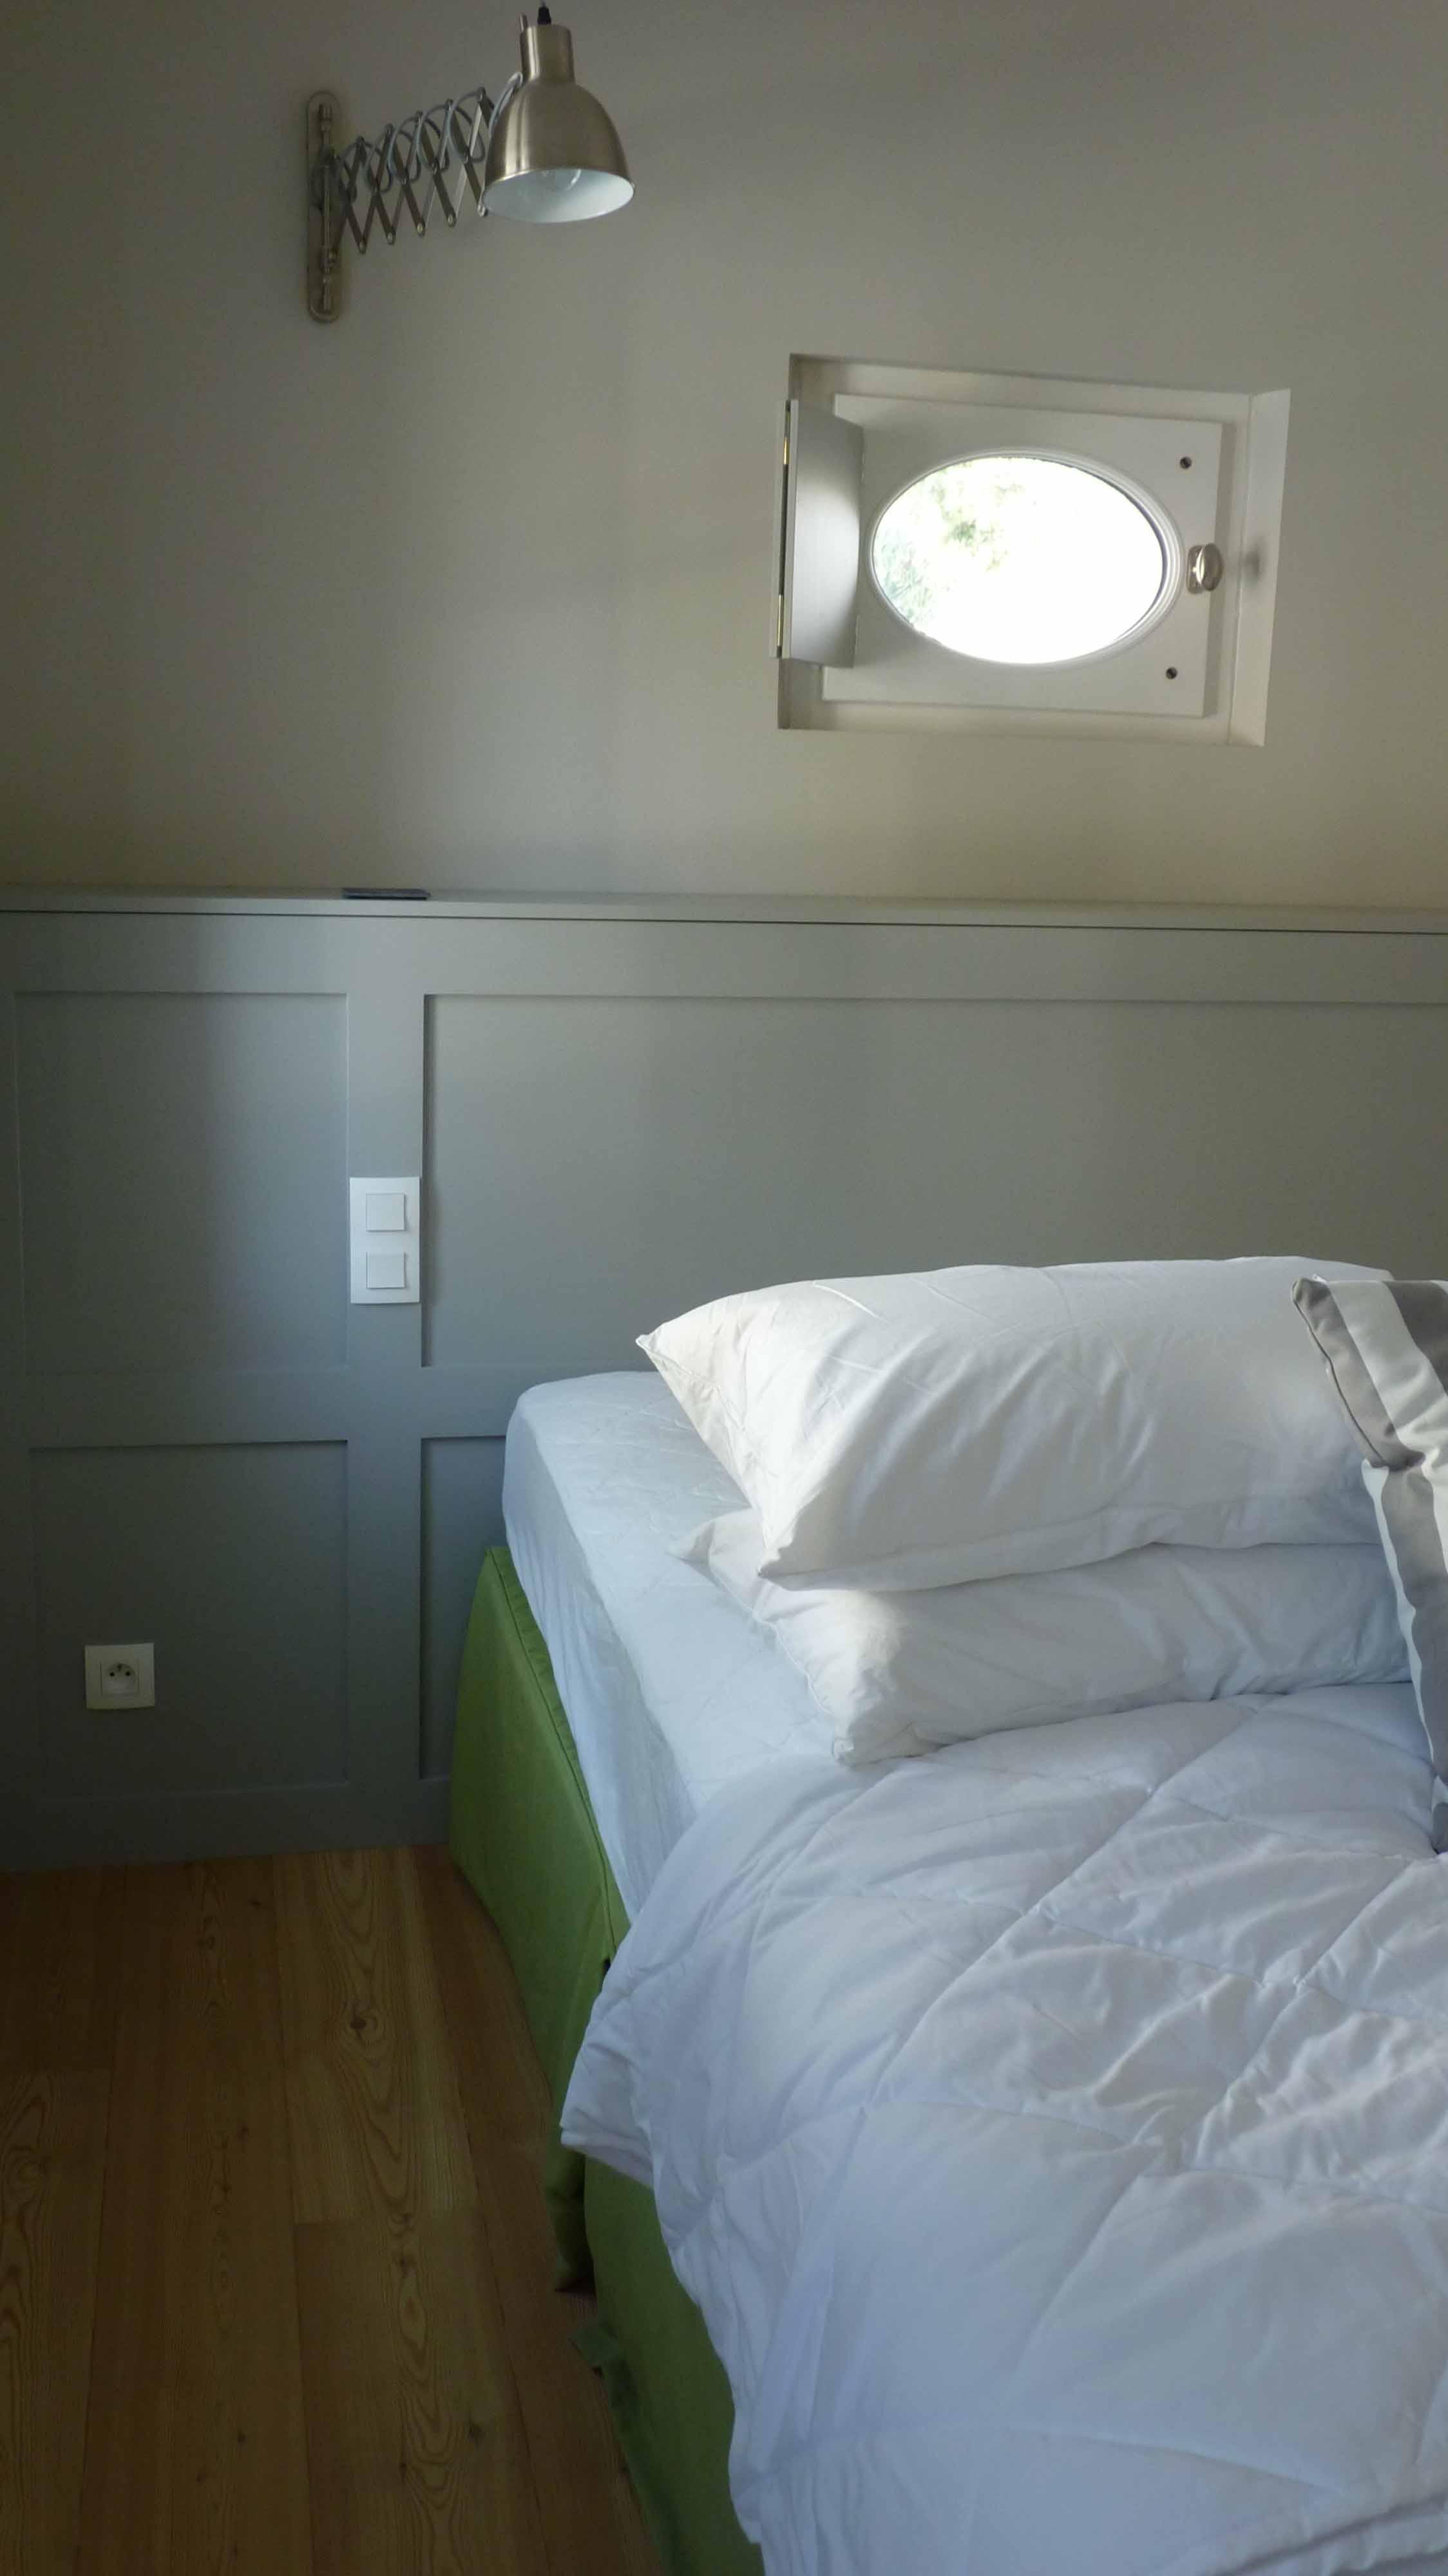 Tête de lit en médium